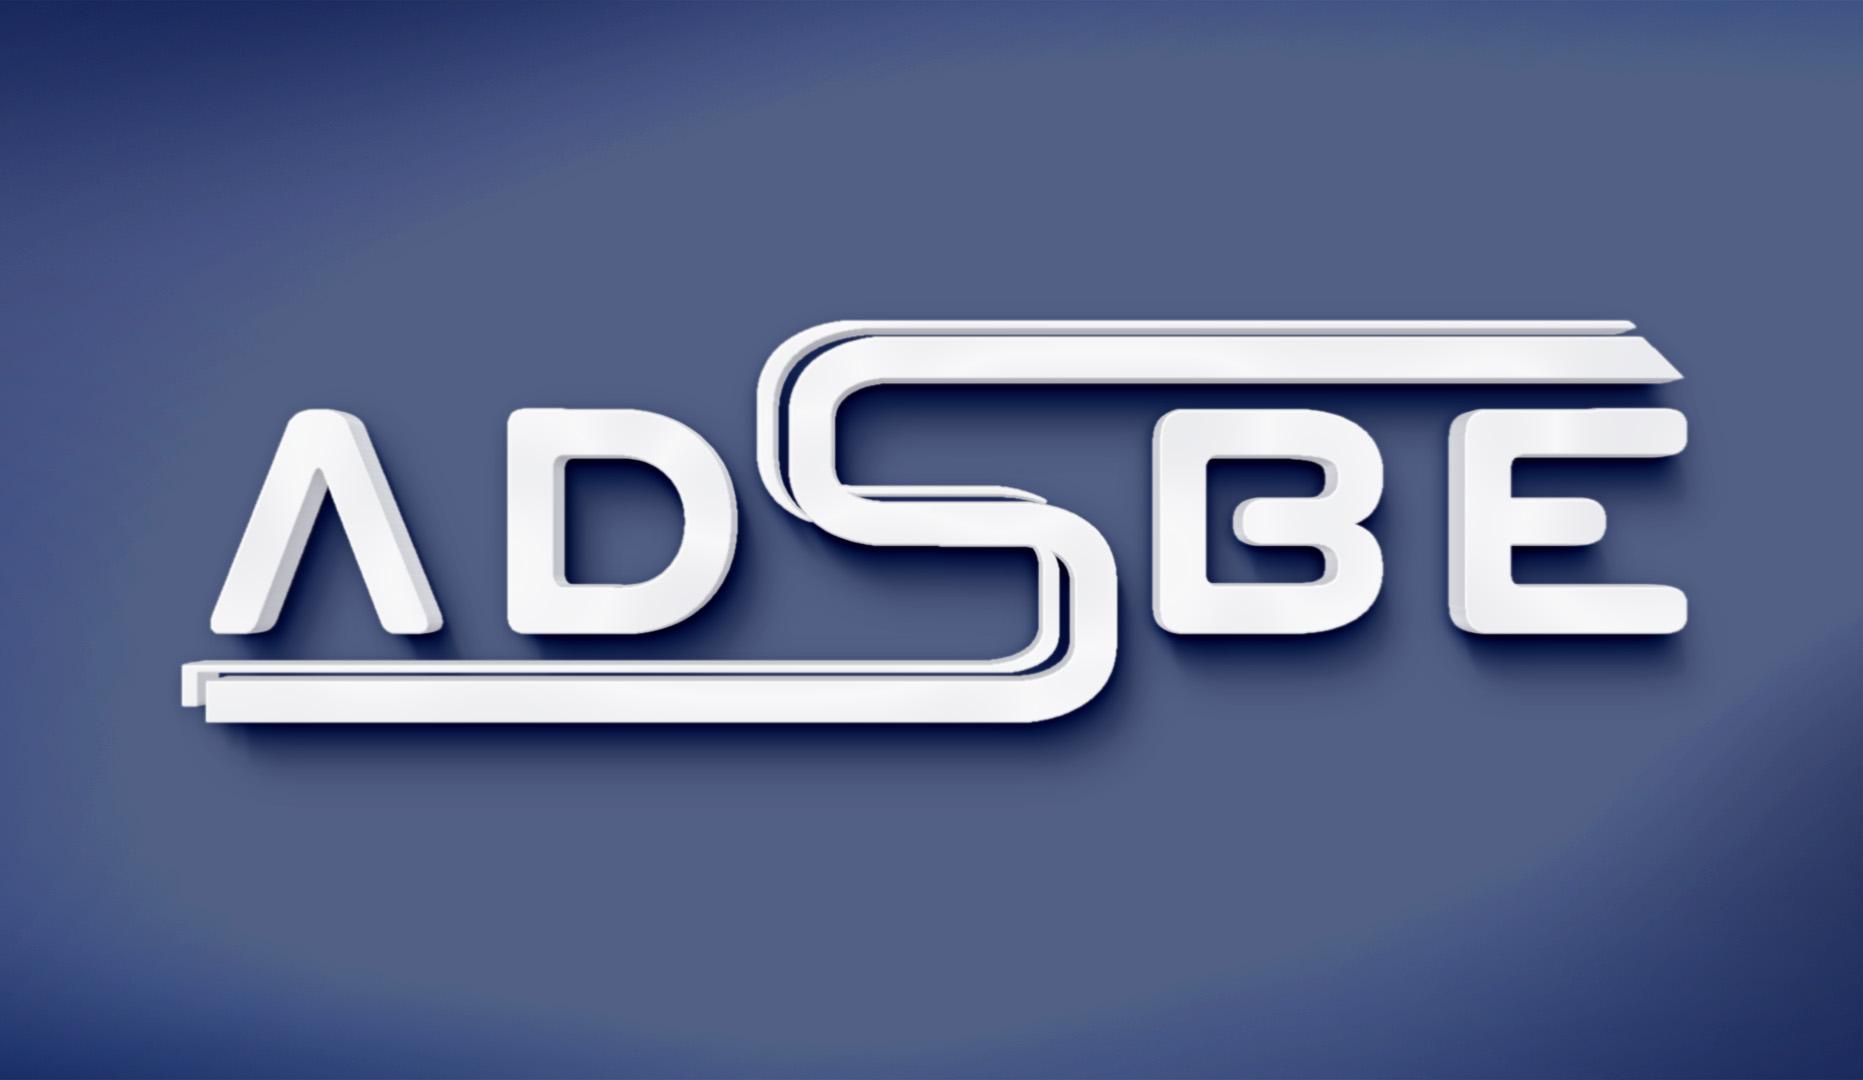 Разработка логотипа для CPA-сети фото f_526587f7e5687686.jpg